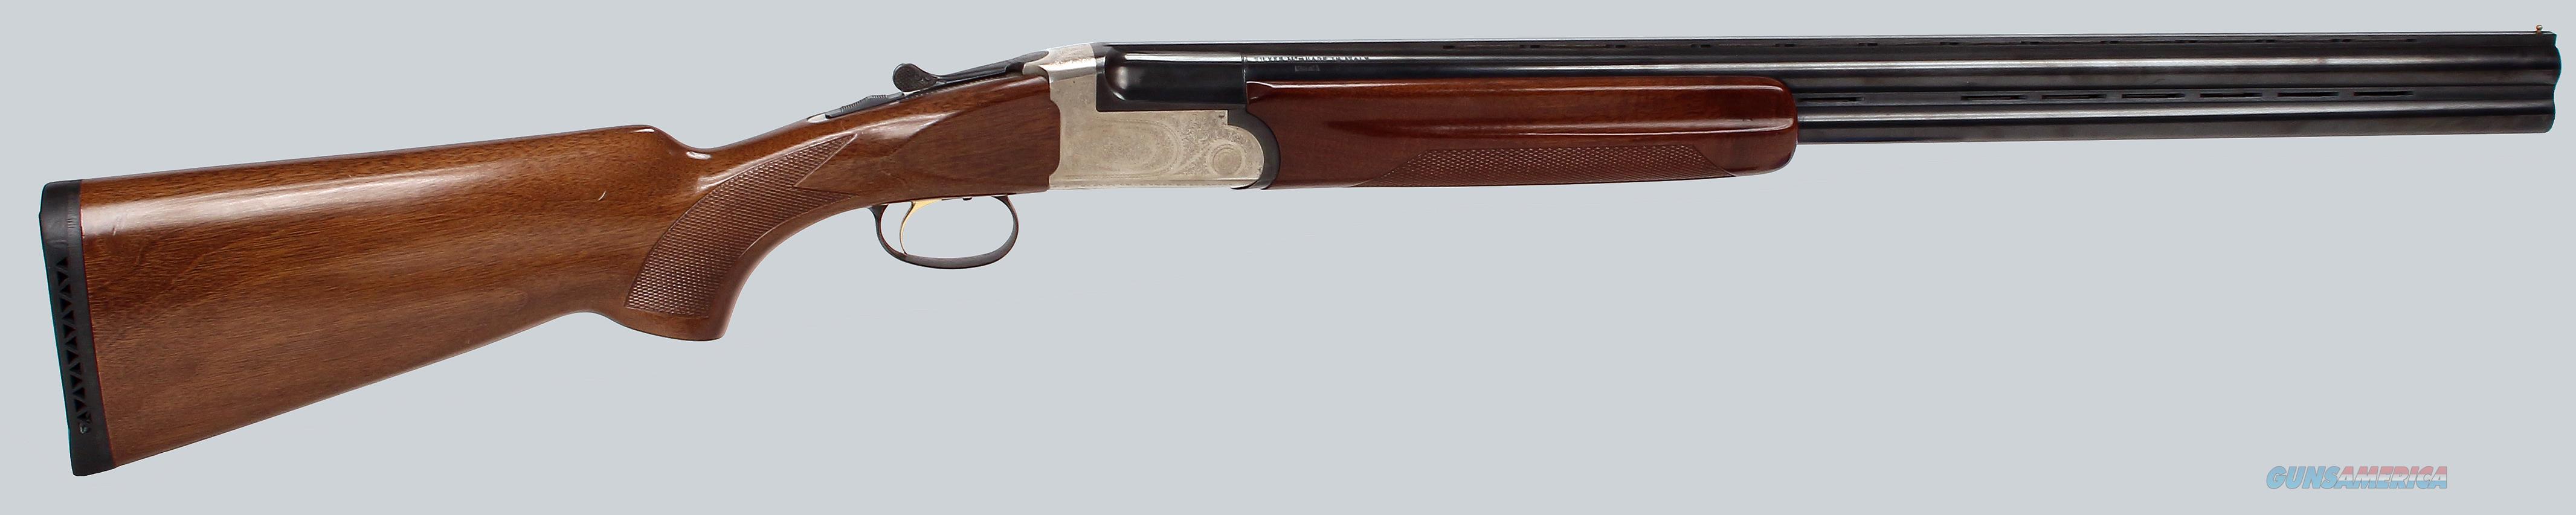 American Arms 12ga Silver II Shotgun  Guns > Shotguns > American Arms Shotguns